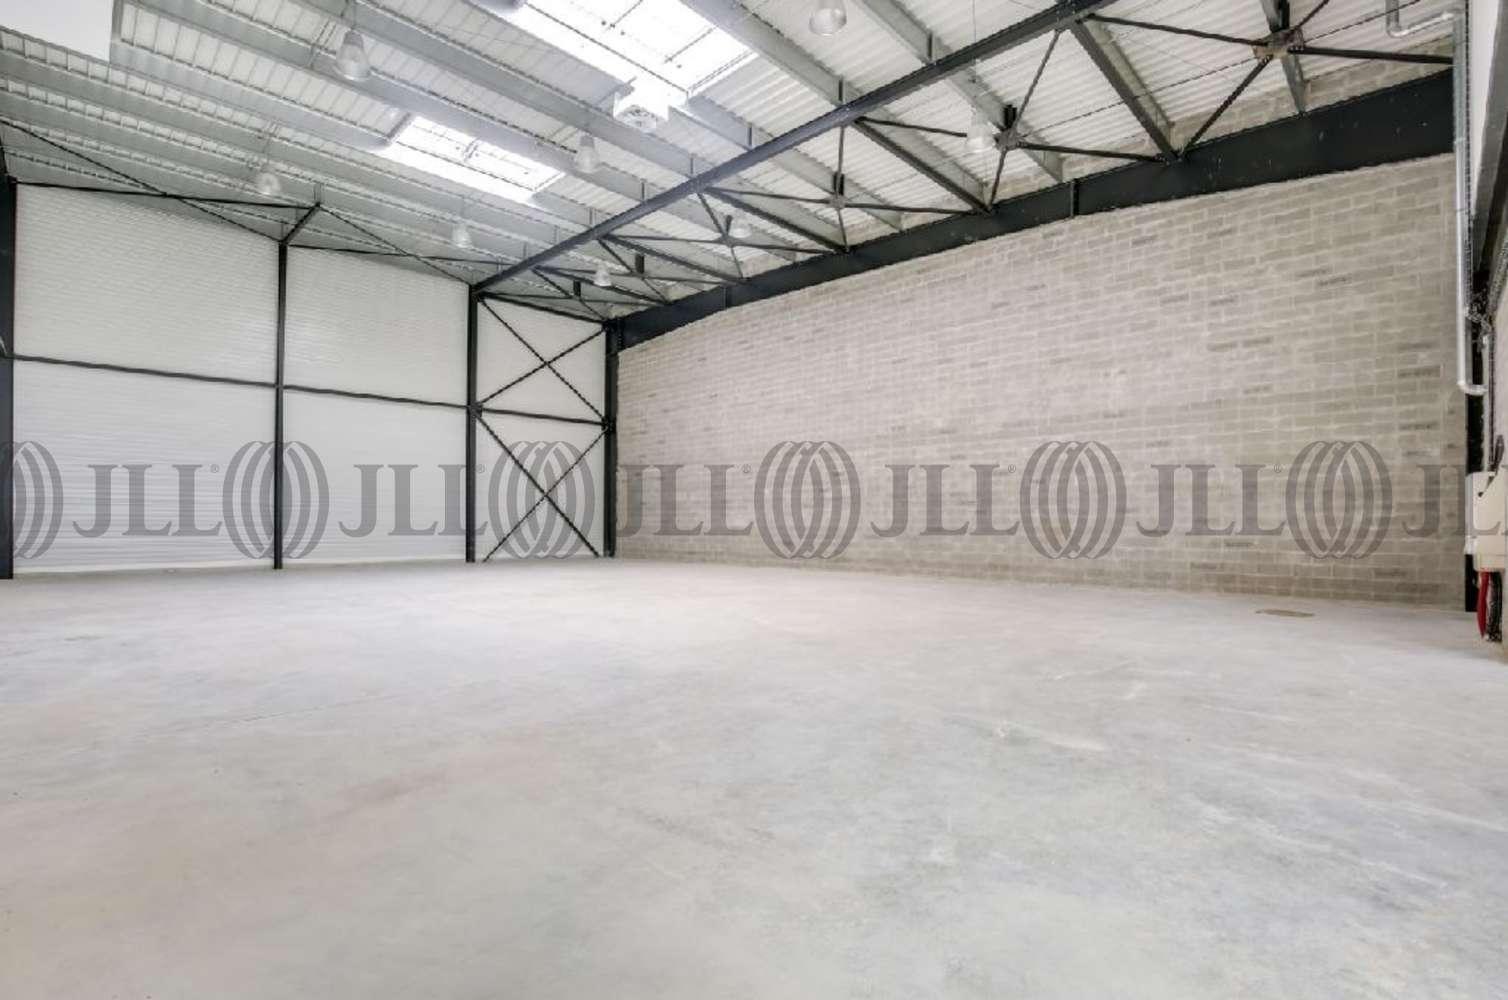 Activités/entrepôt Villebon sur yvette, 91140 - OGMA - 9621386